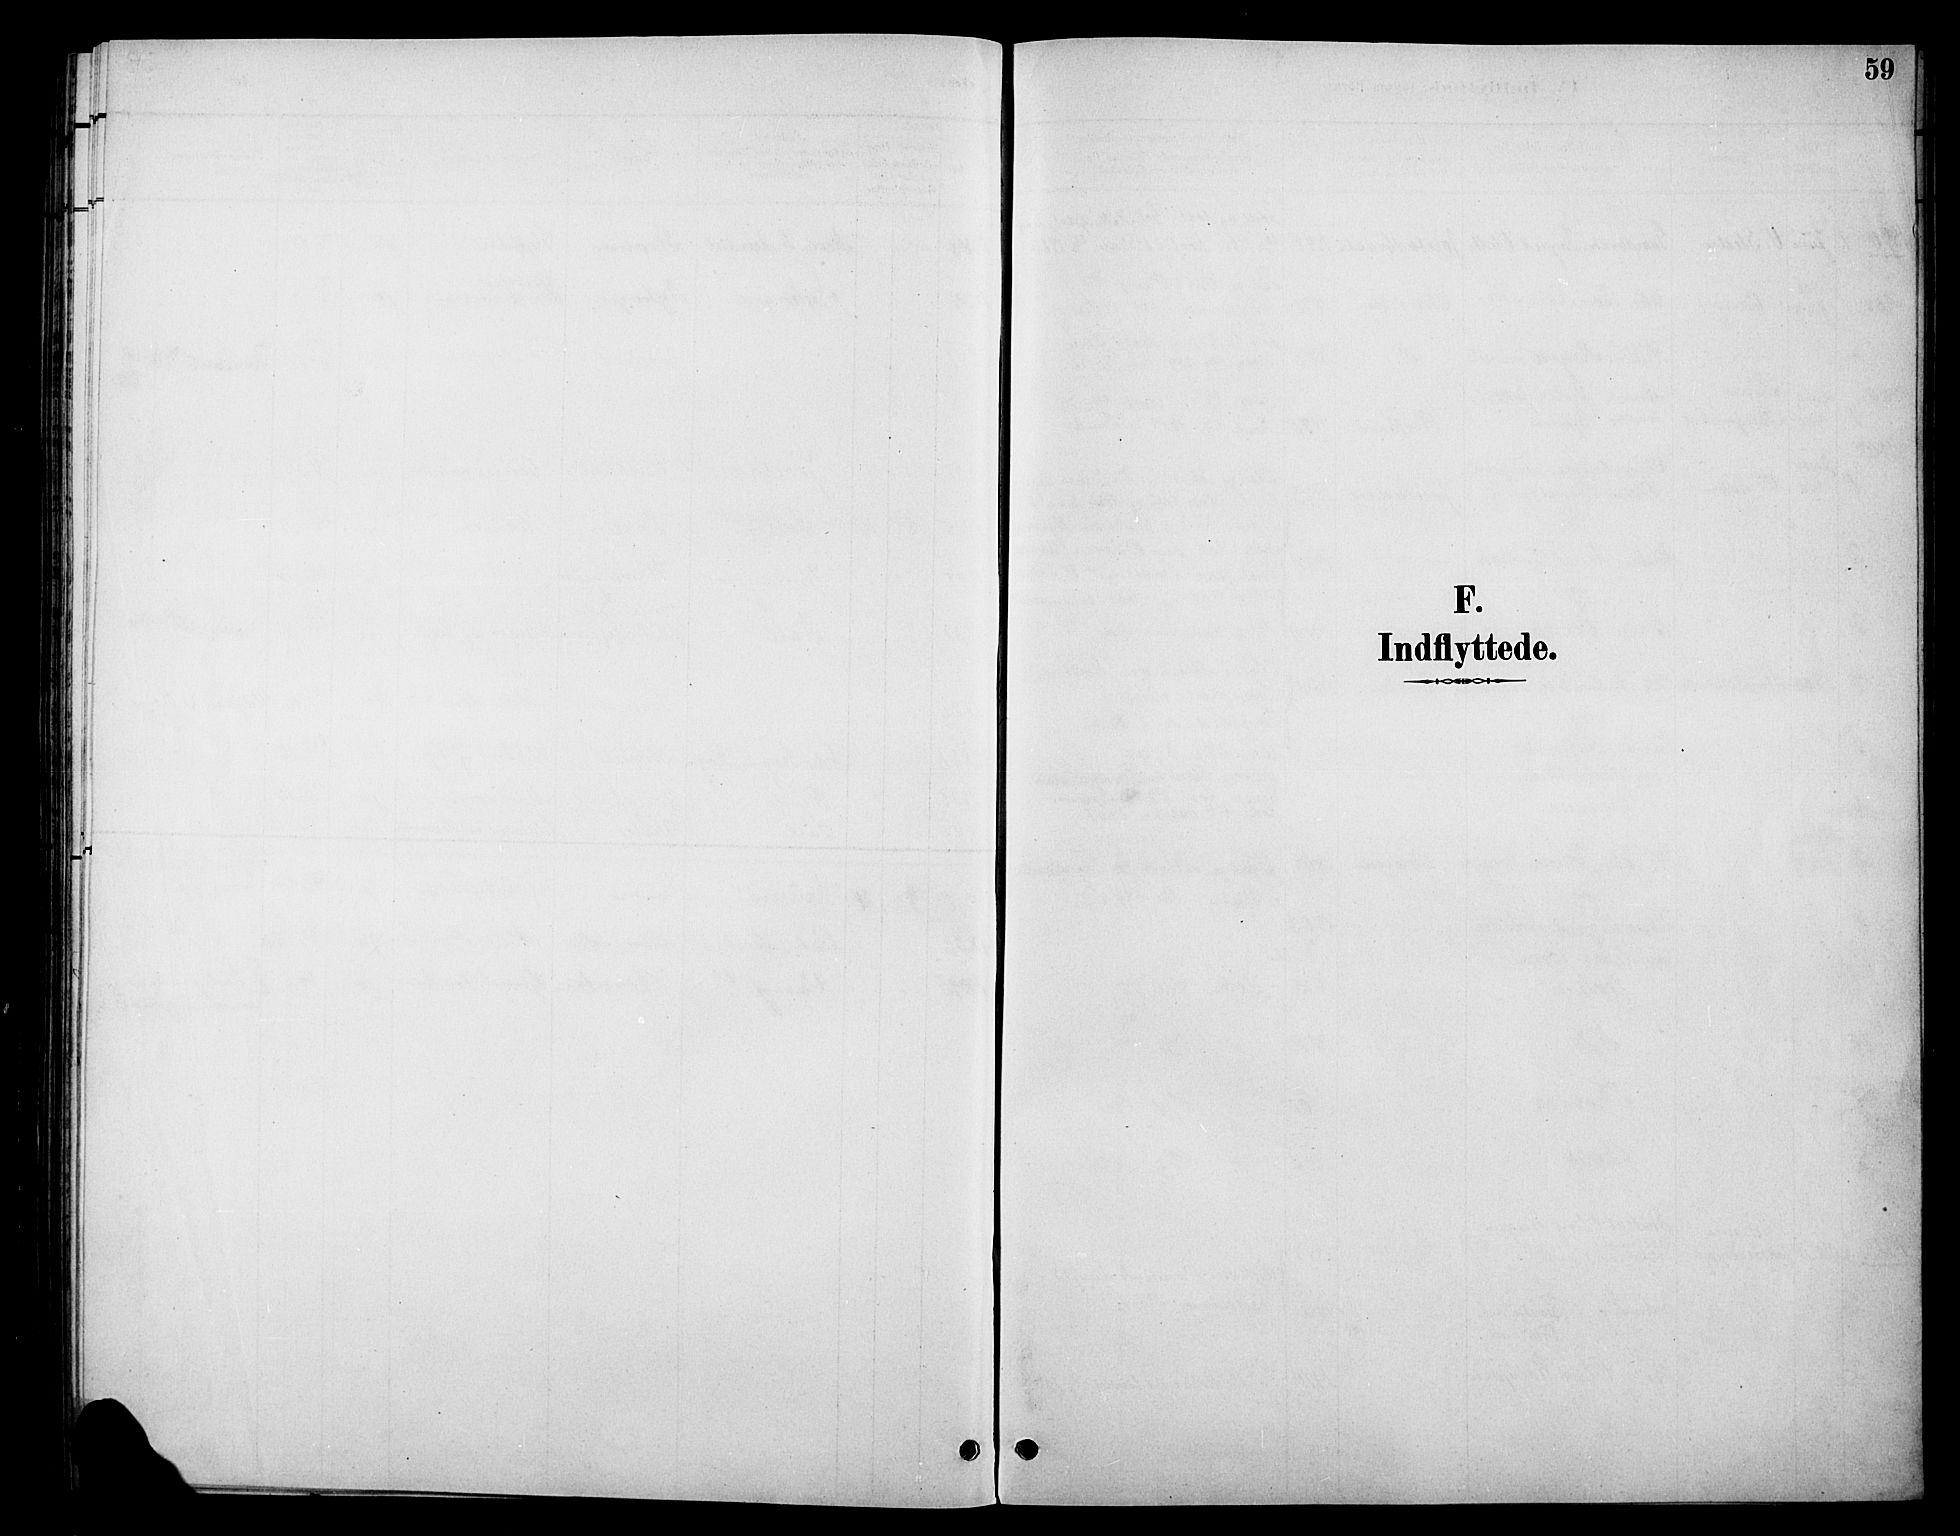 SAH, Øystre Slidre prestekontor, Klokkerbok nr. 6, 1887-1916, s. 59